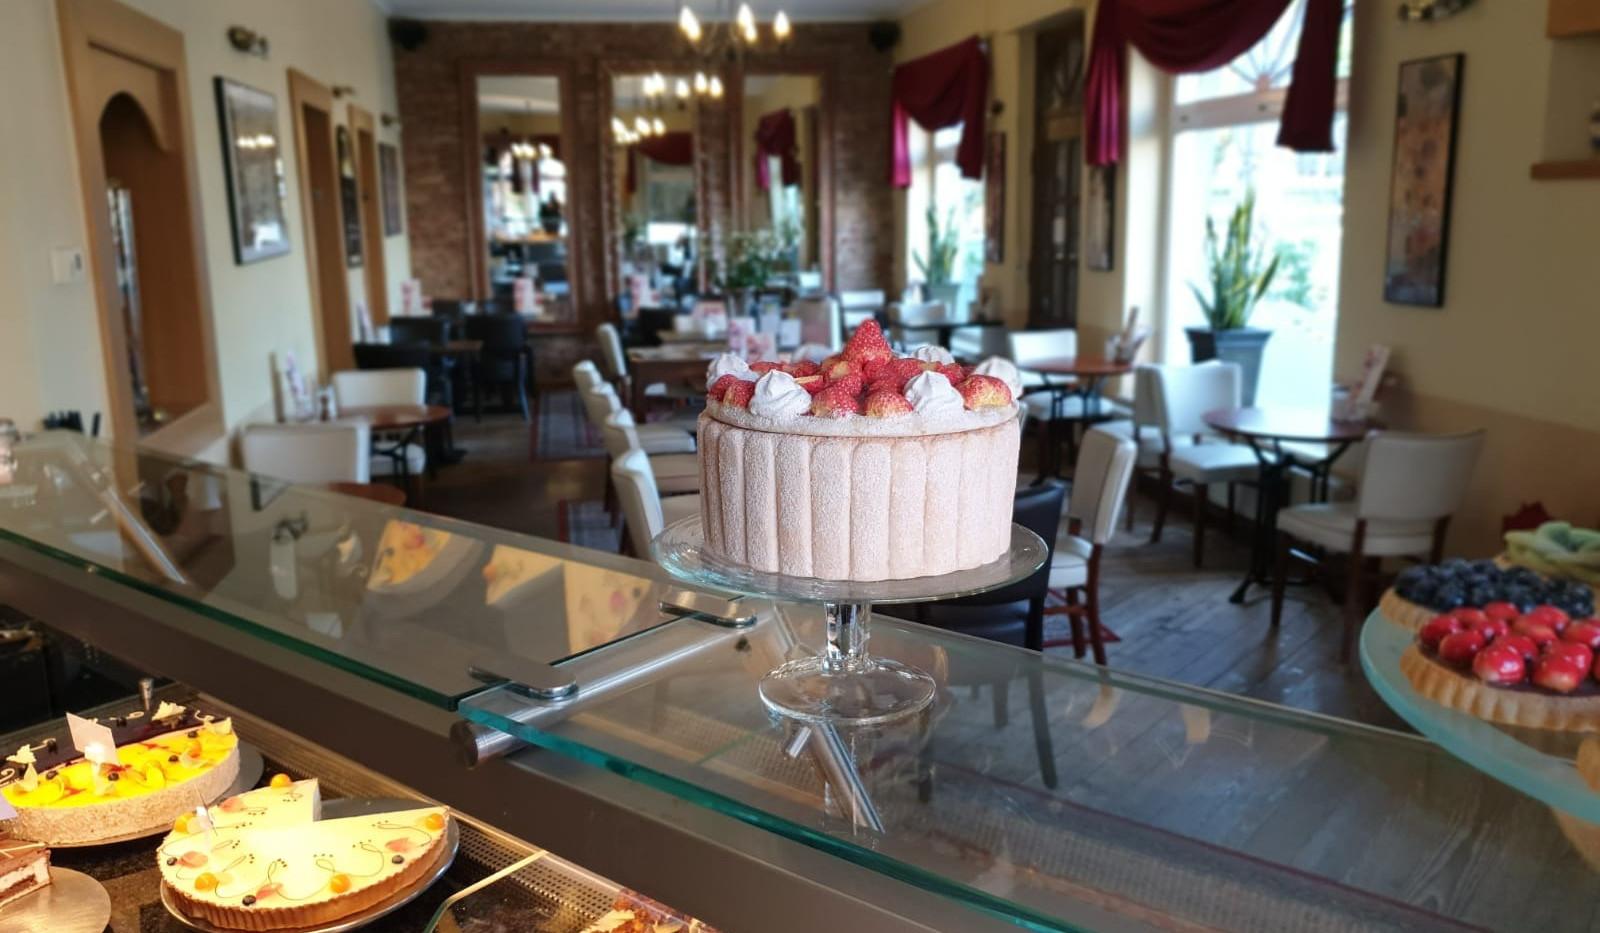 cafe-liege-aachen-brand-torten-auswahl-verkauf.jpg